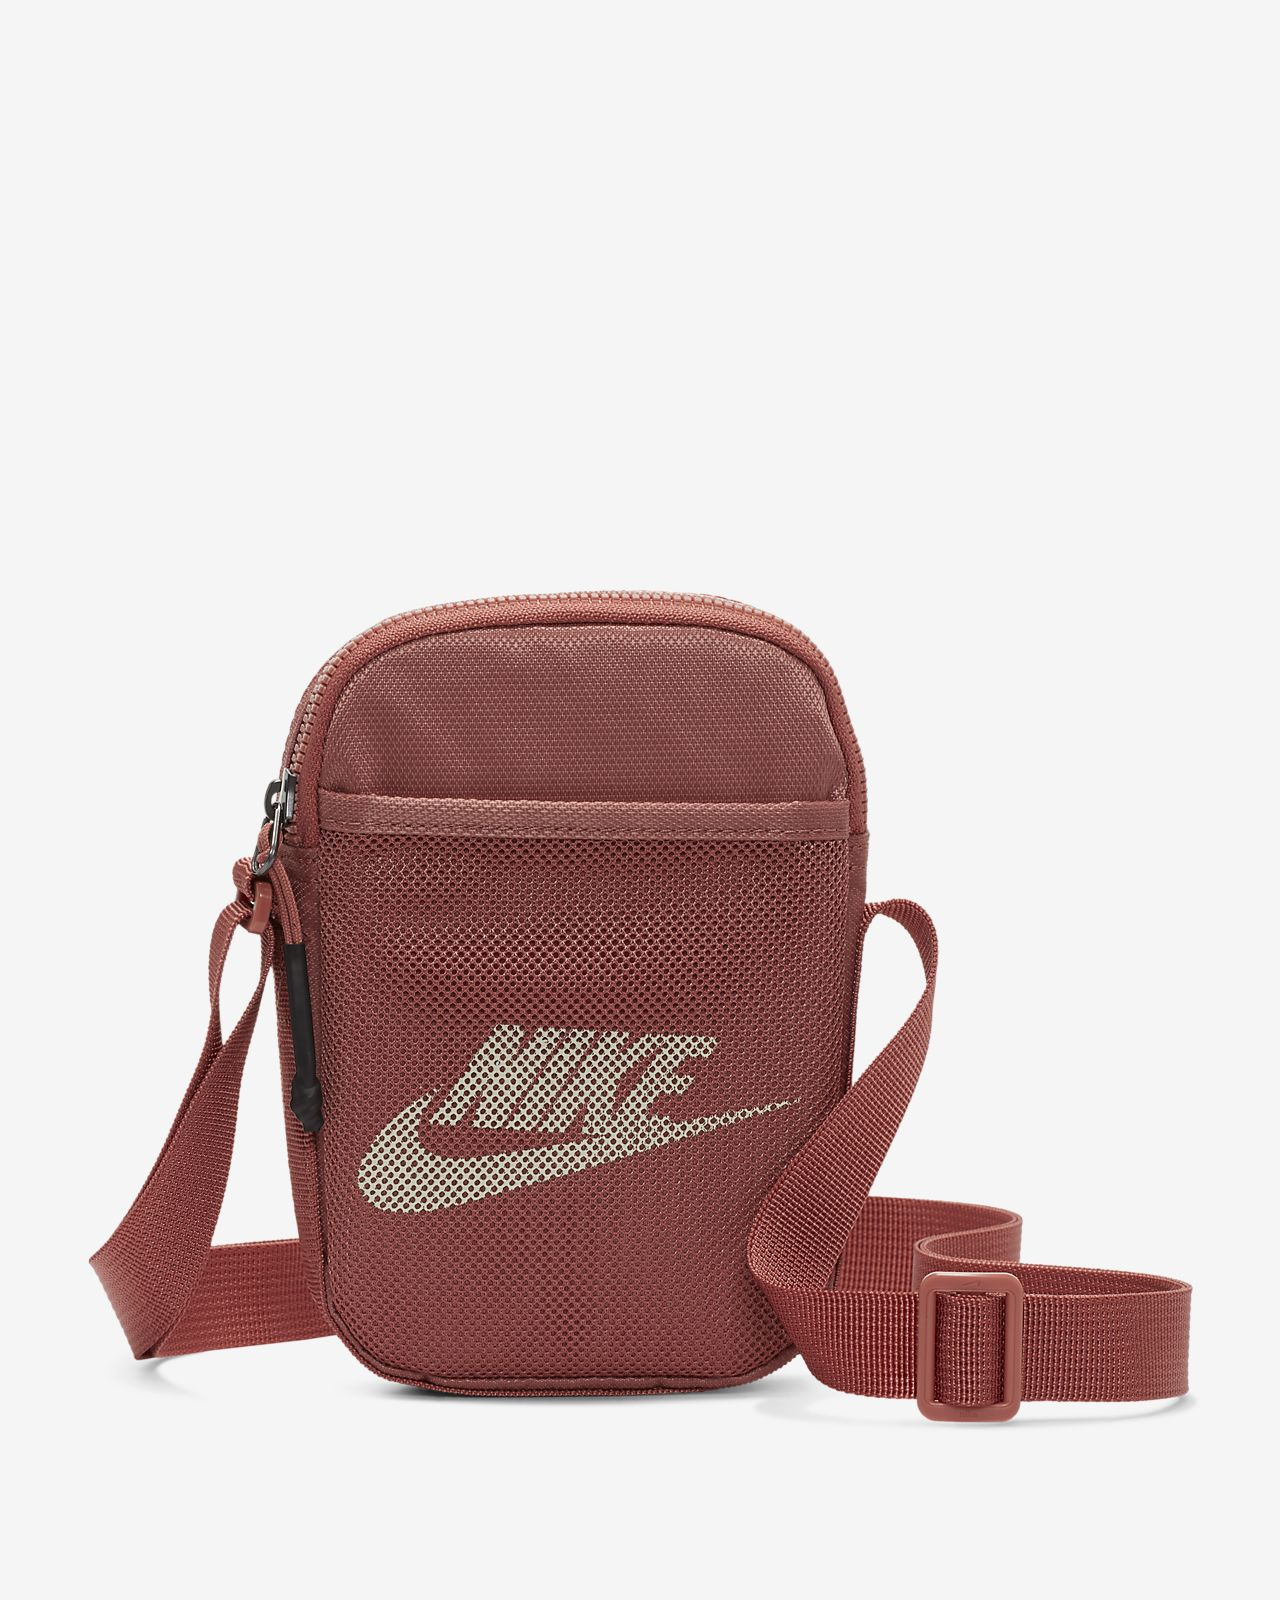 Nike Heritage Bossa creuada (petita)